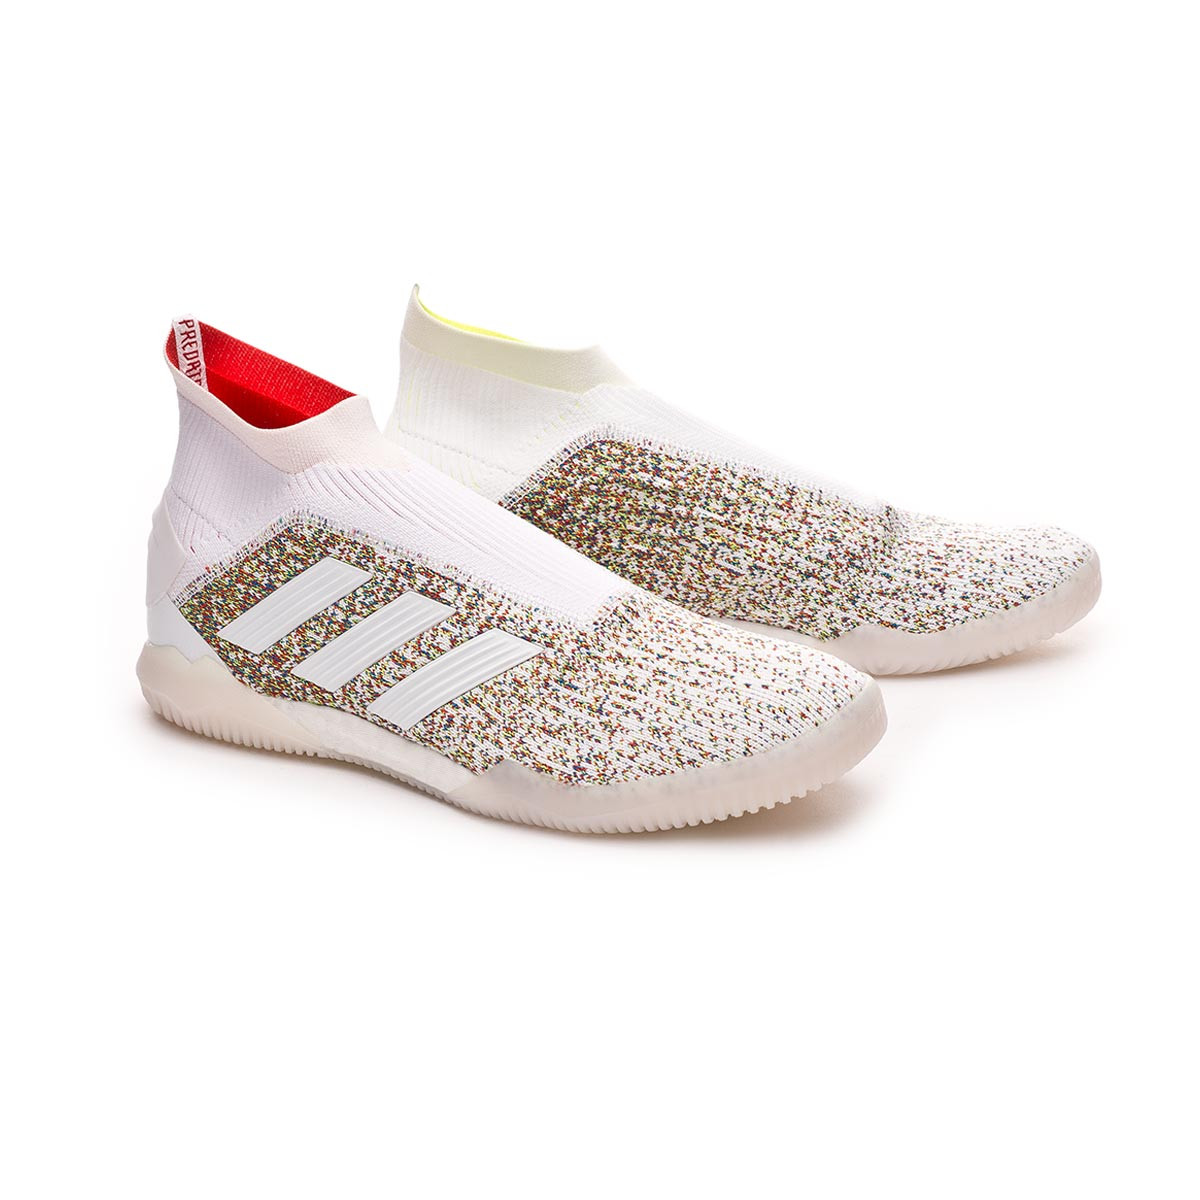 Trainers adidas Predator 19+ TR White